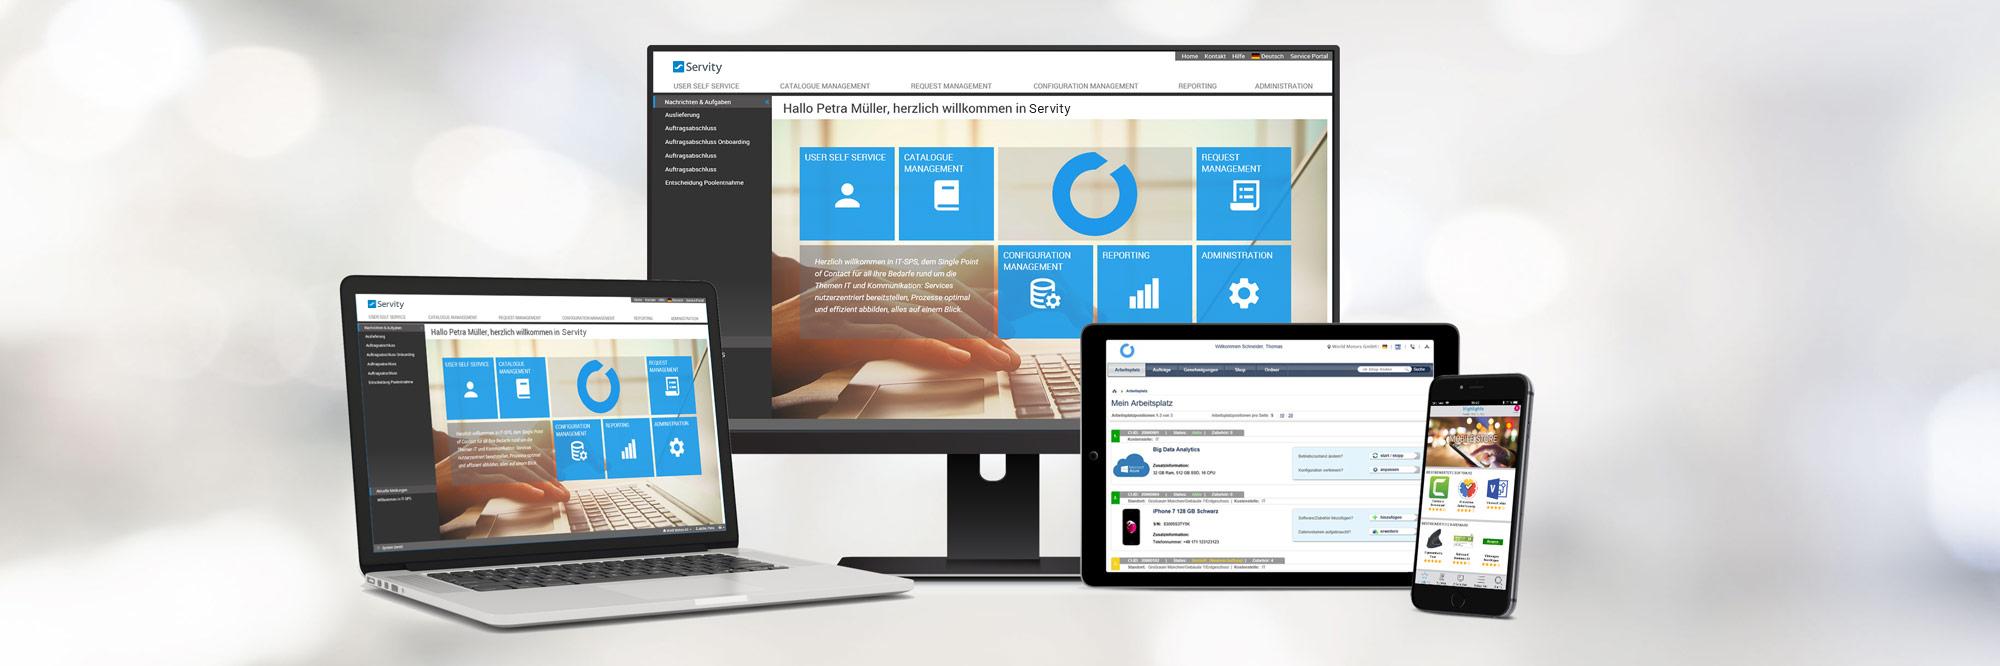 Servity Enterprise Service Management Software